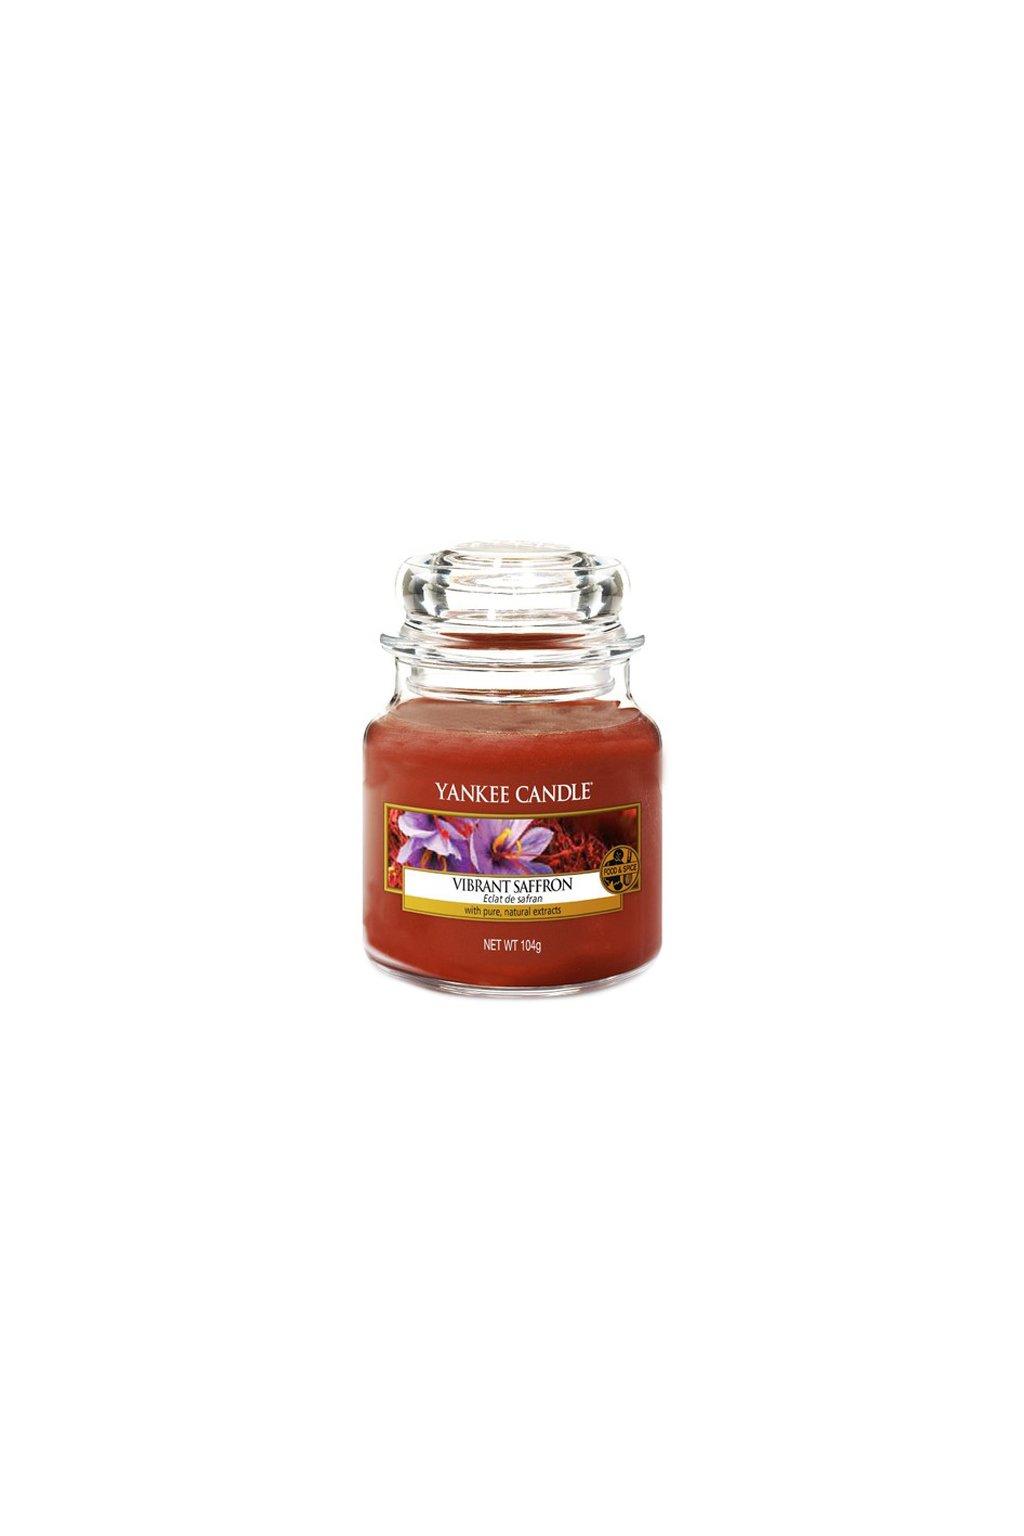 Yankee Candle Vibrant Saffron 104g